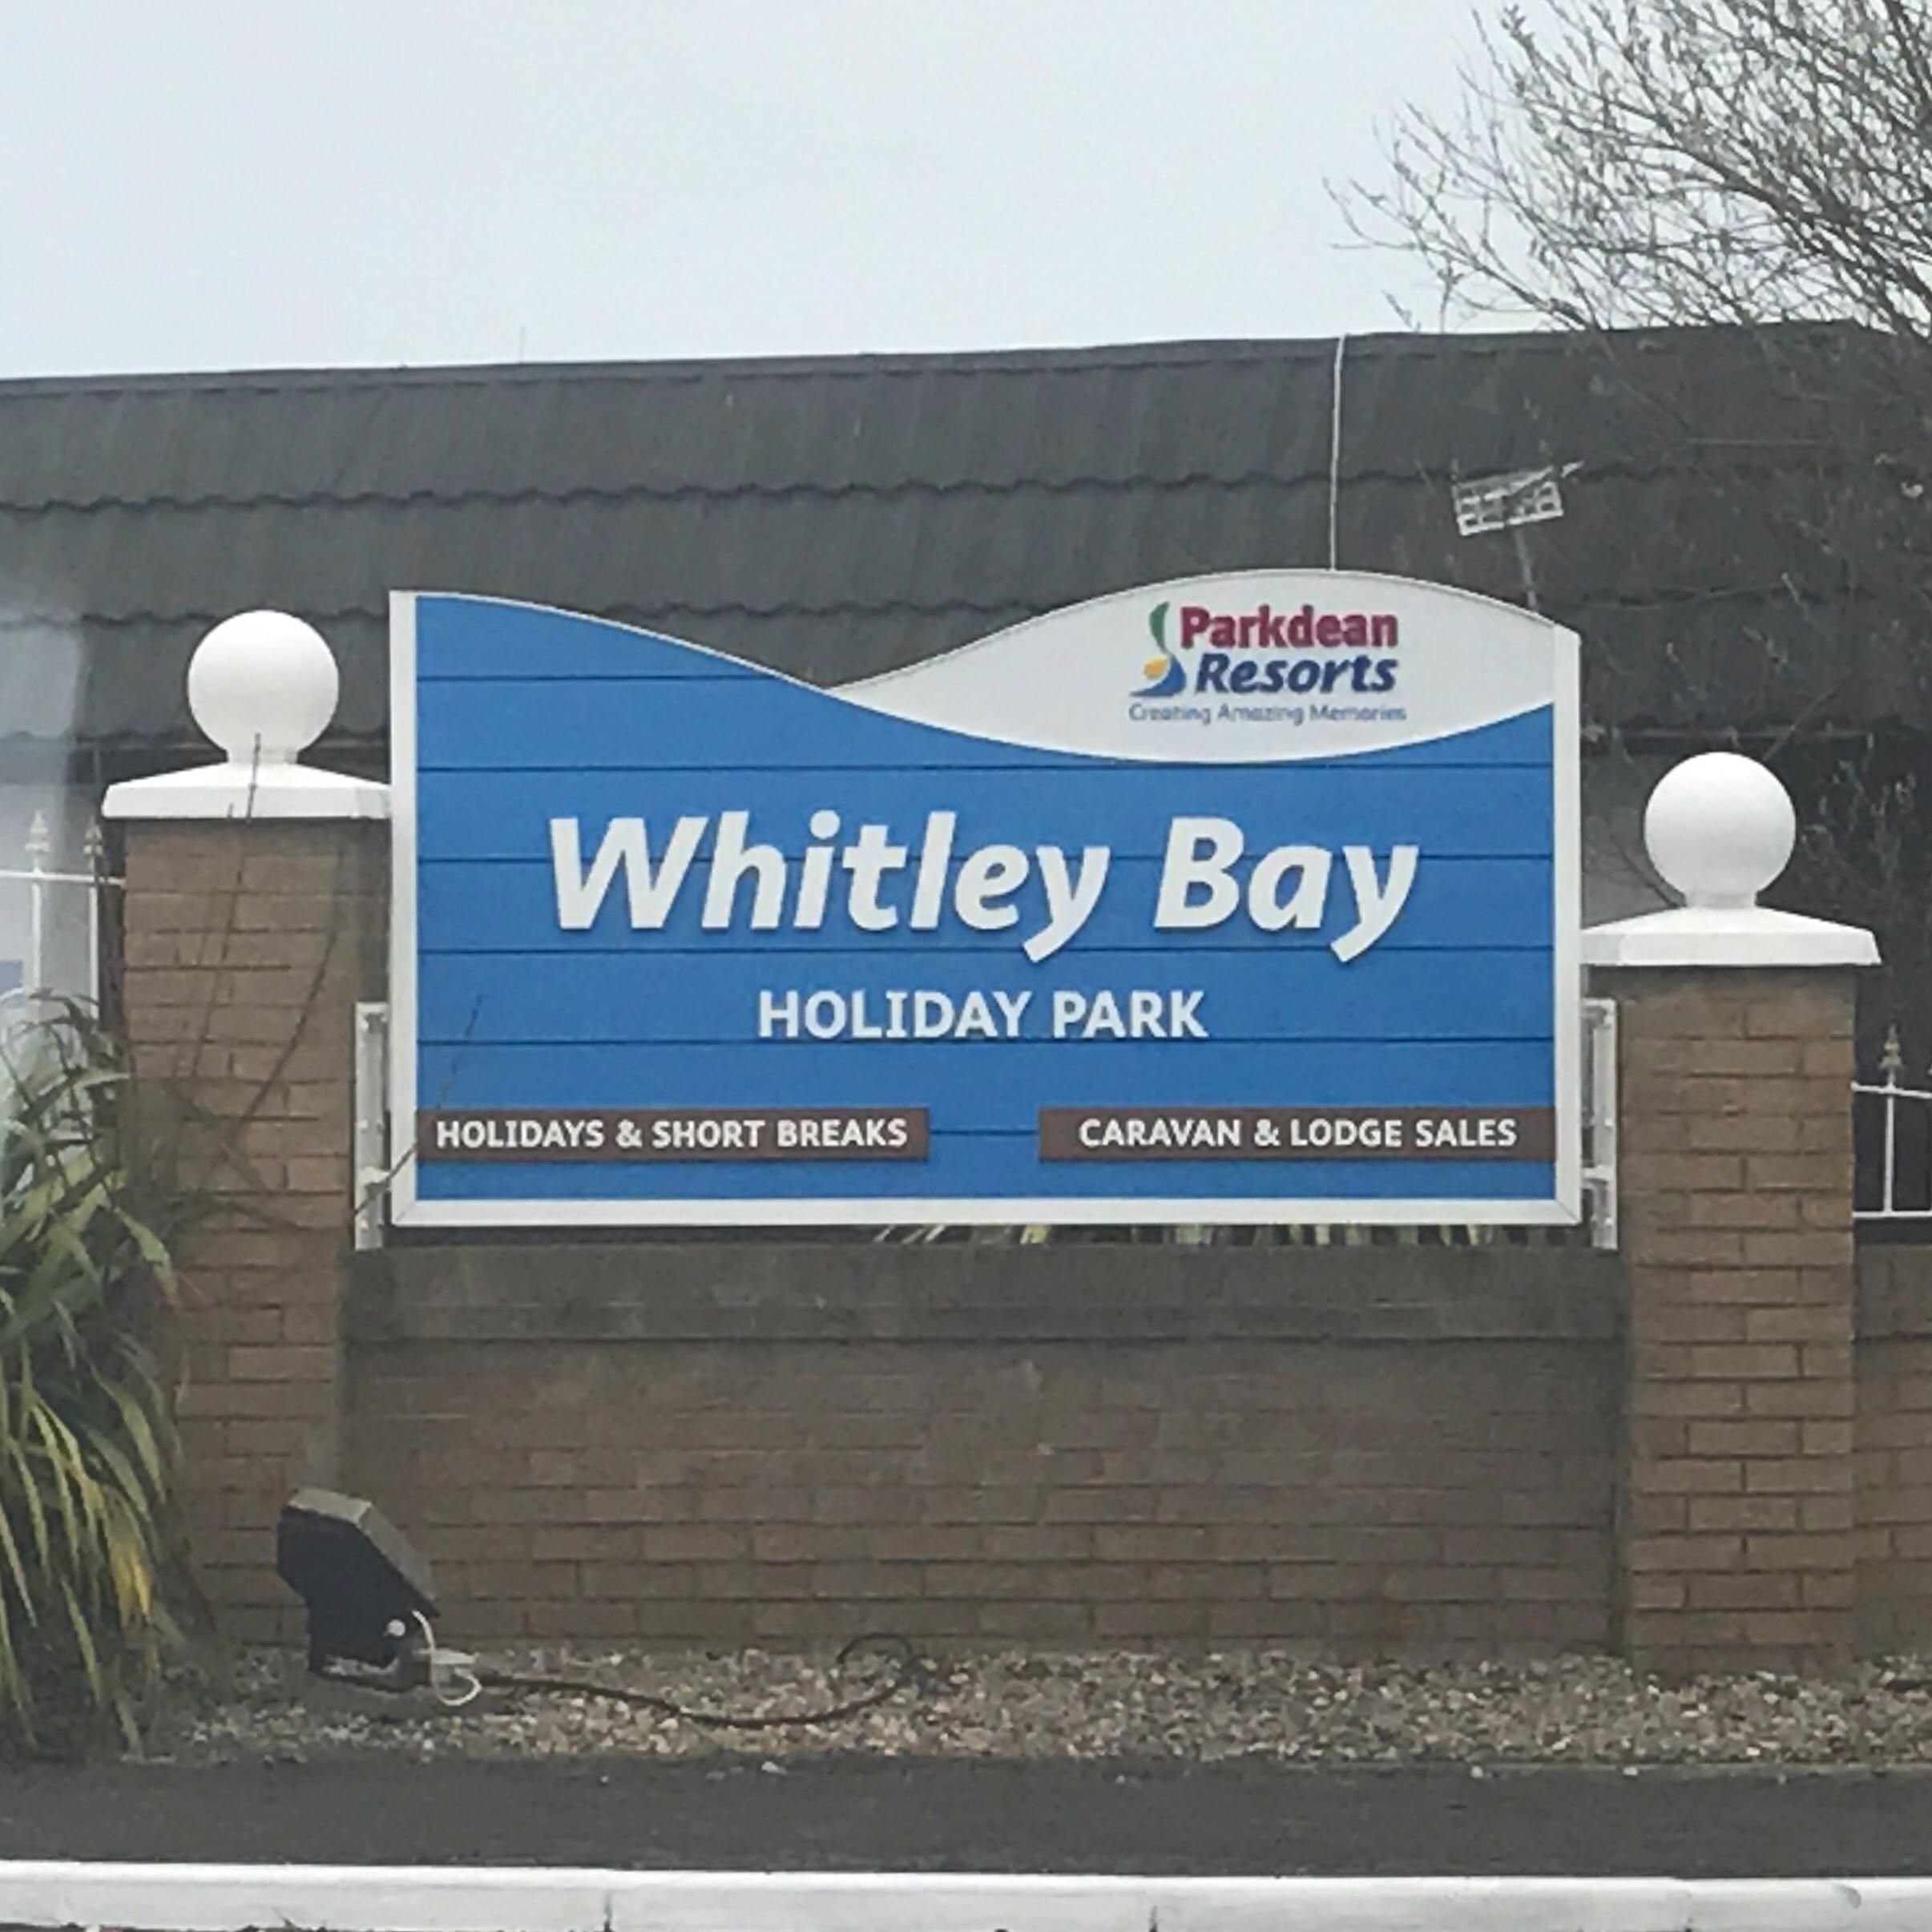 Whitley Bay Park Dean Resort